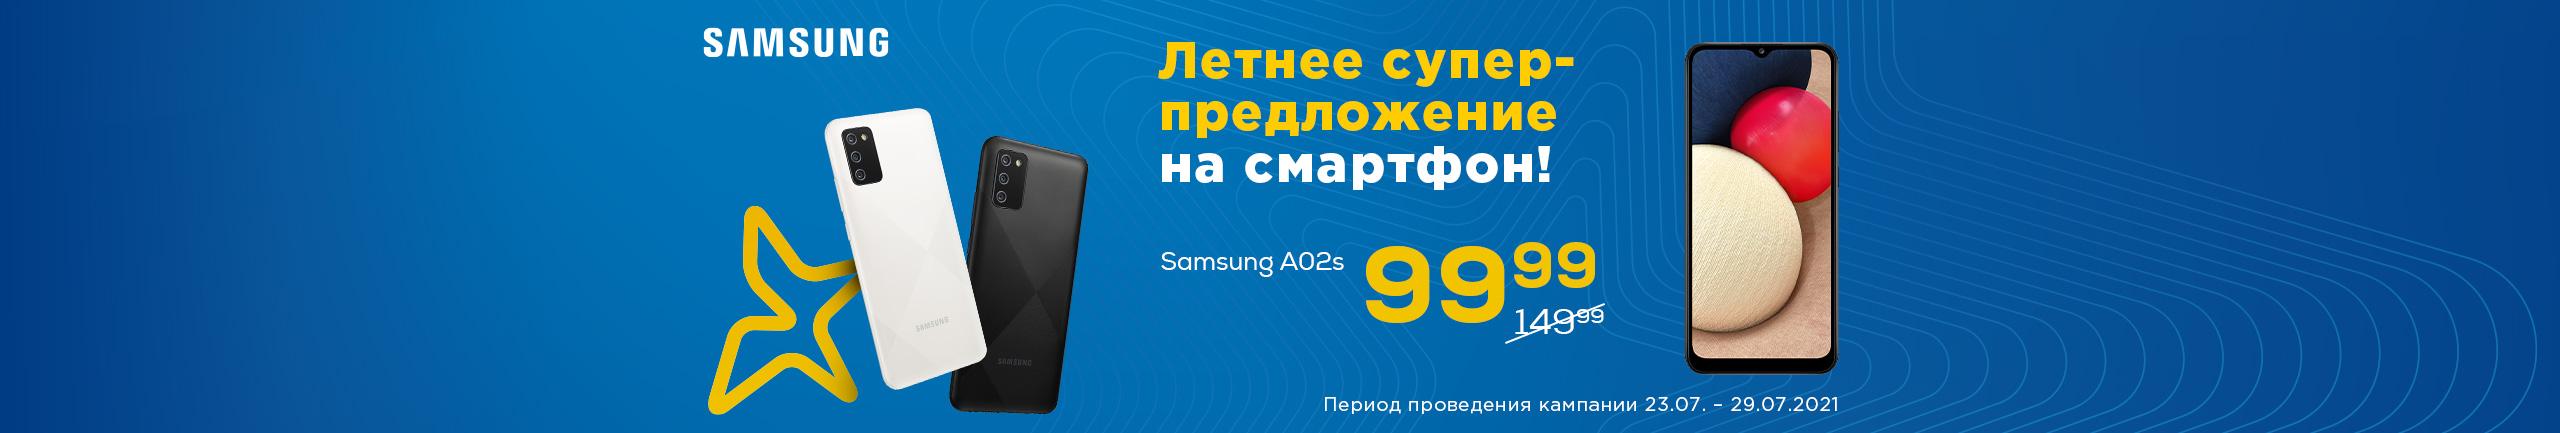 Летнее суперпредложение от Samsung!